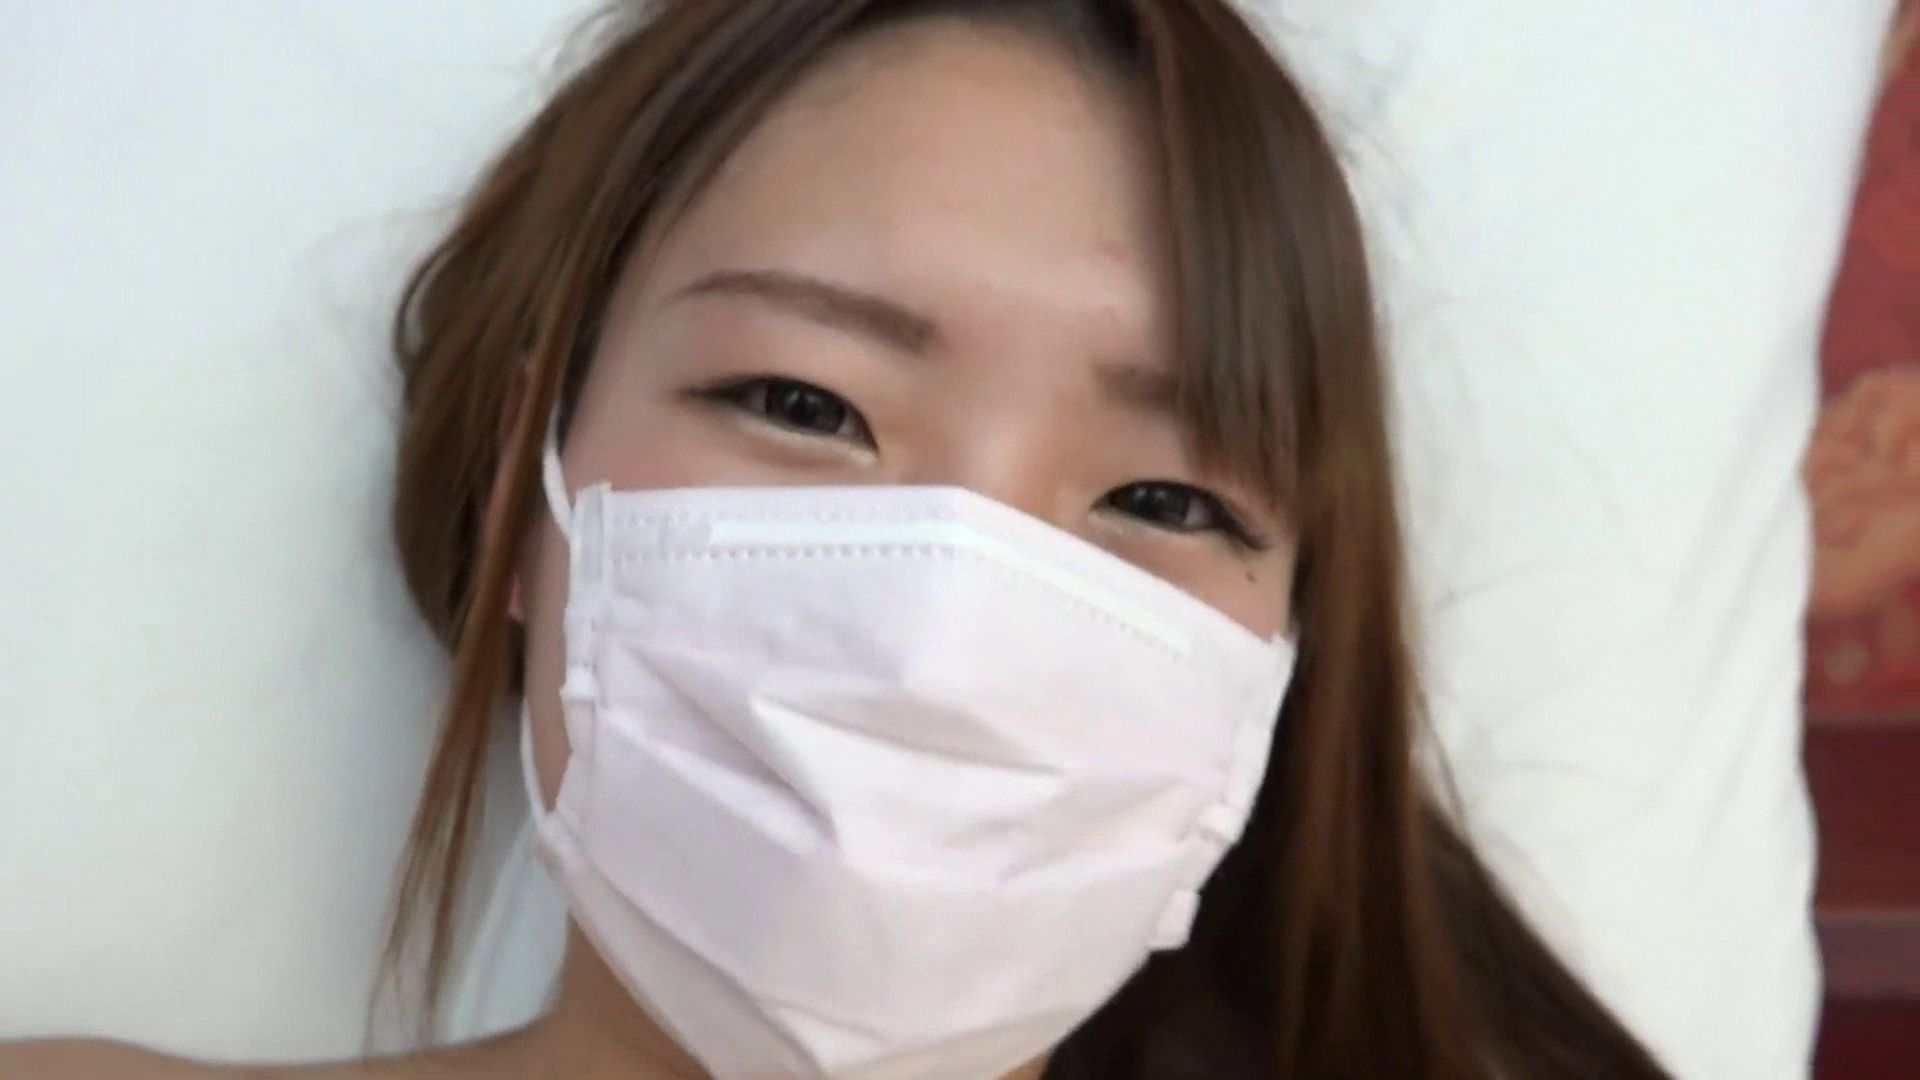 S級厳選美女ビッチガールVol.40 前編 美女 | モデル  34連発 31